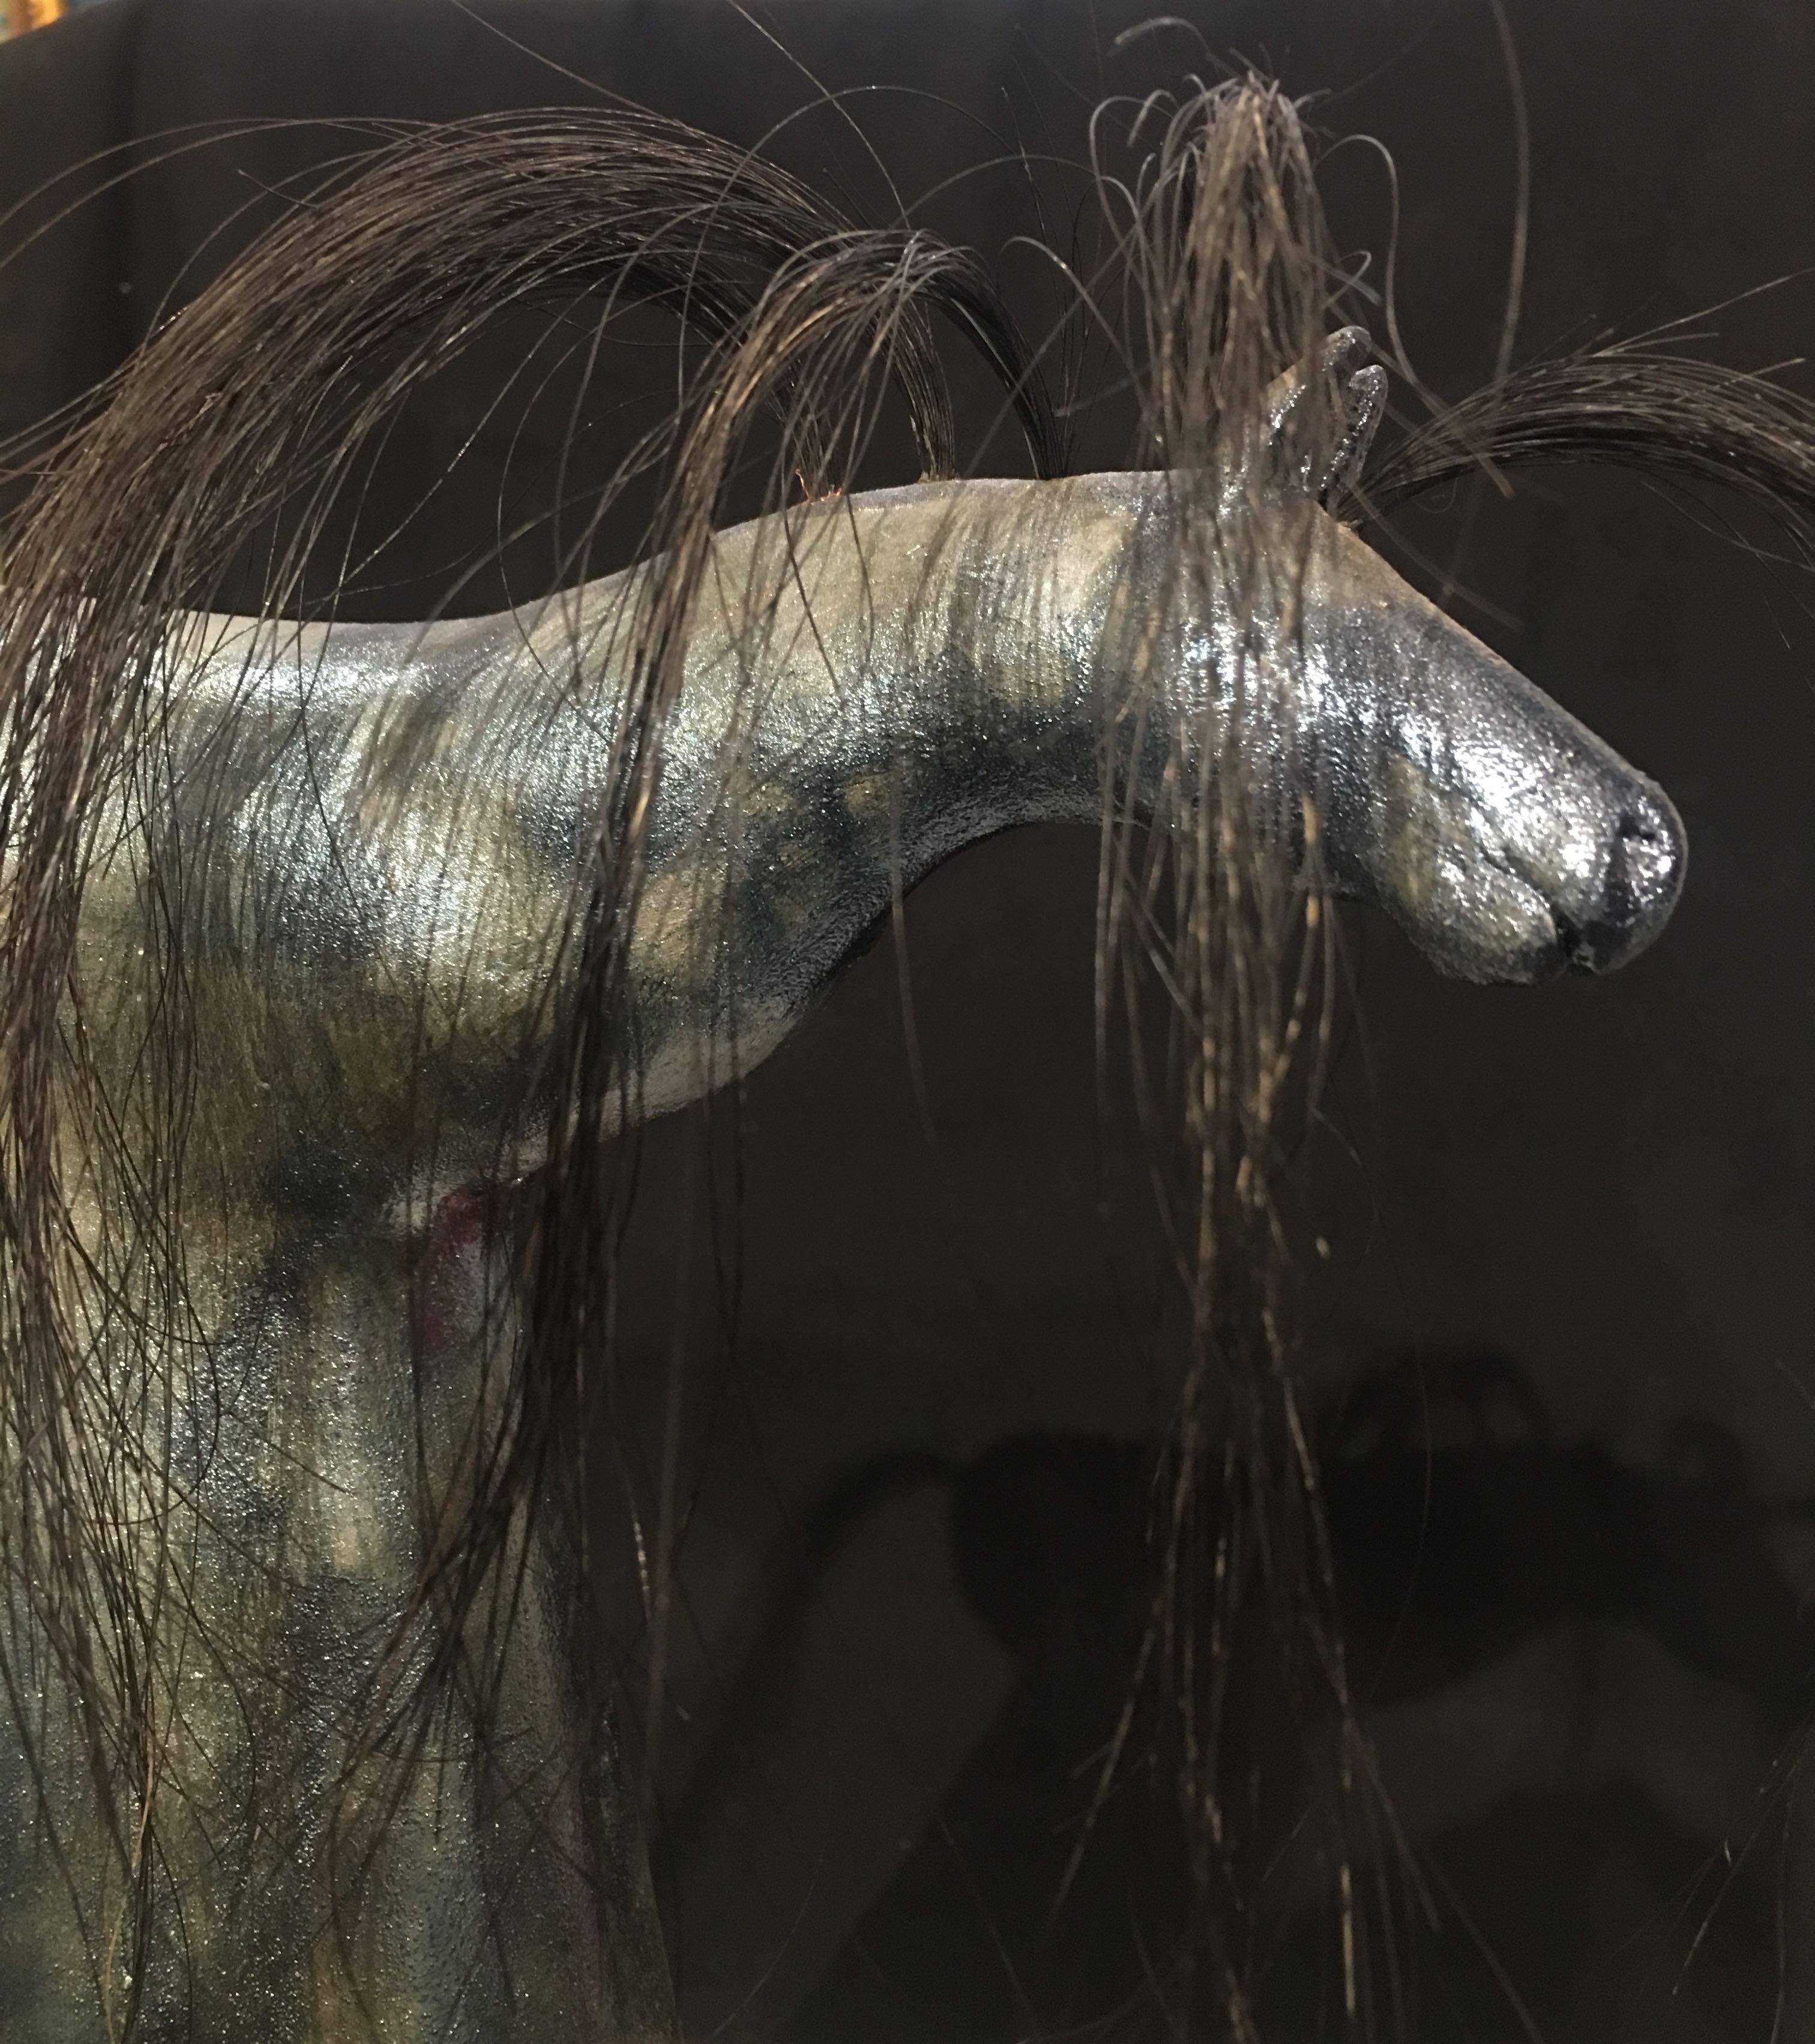 Raku Horse by Judi Iannocito - Handmade Colorado Pottery